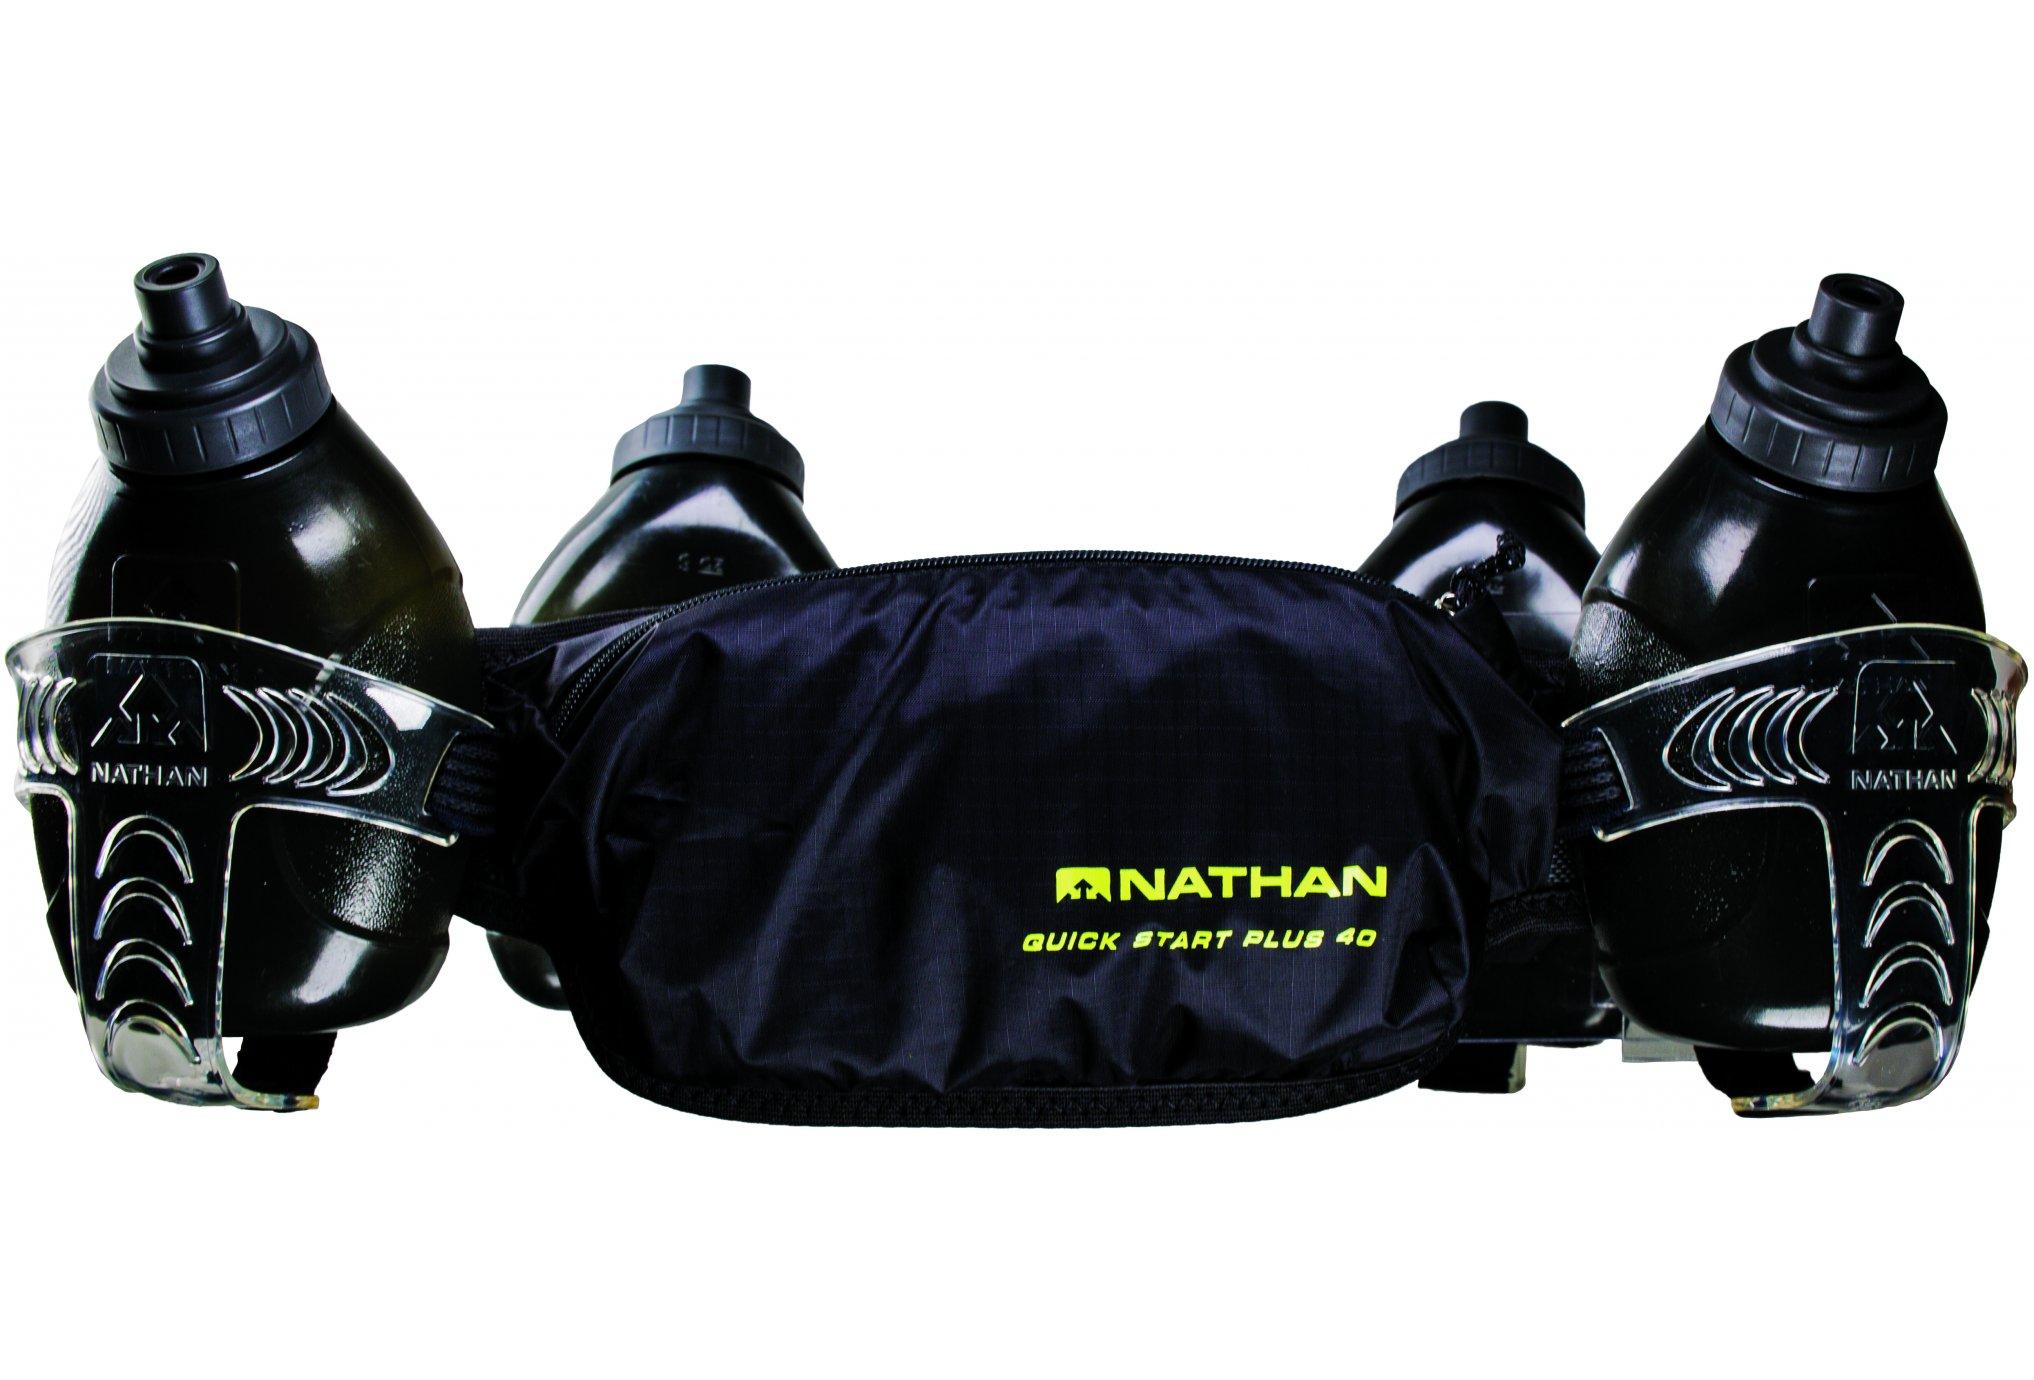 Nathan QuickStart Plus 40 Sac hydratation / Gourde